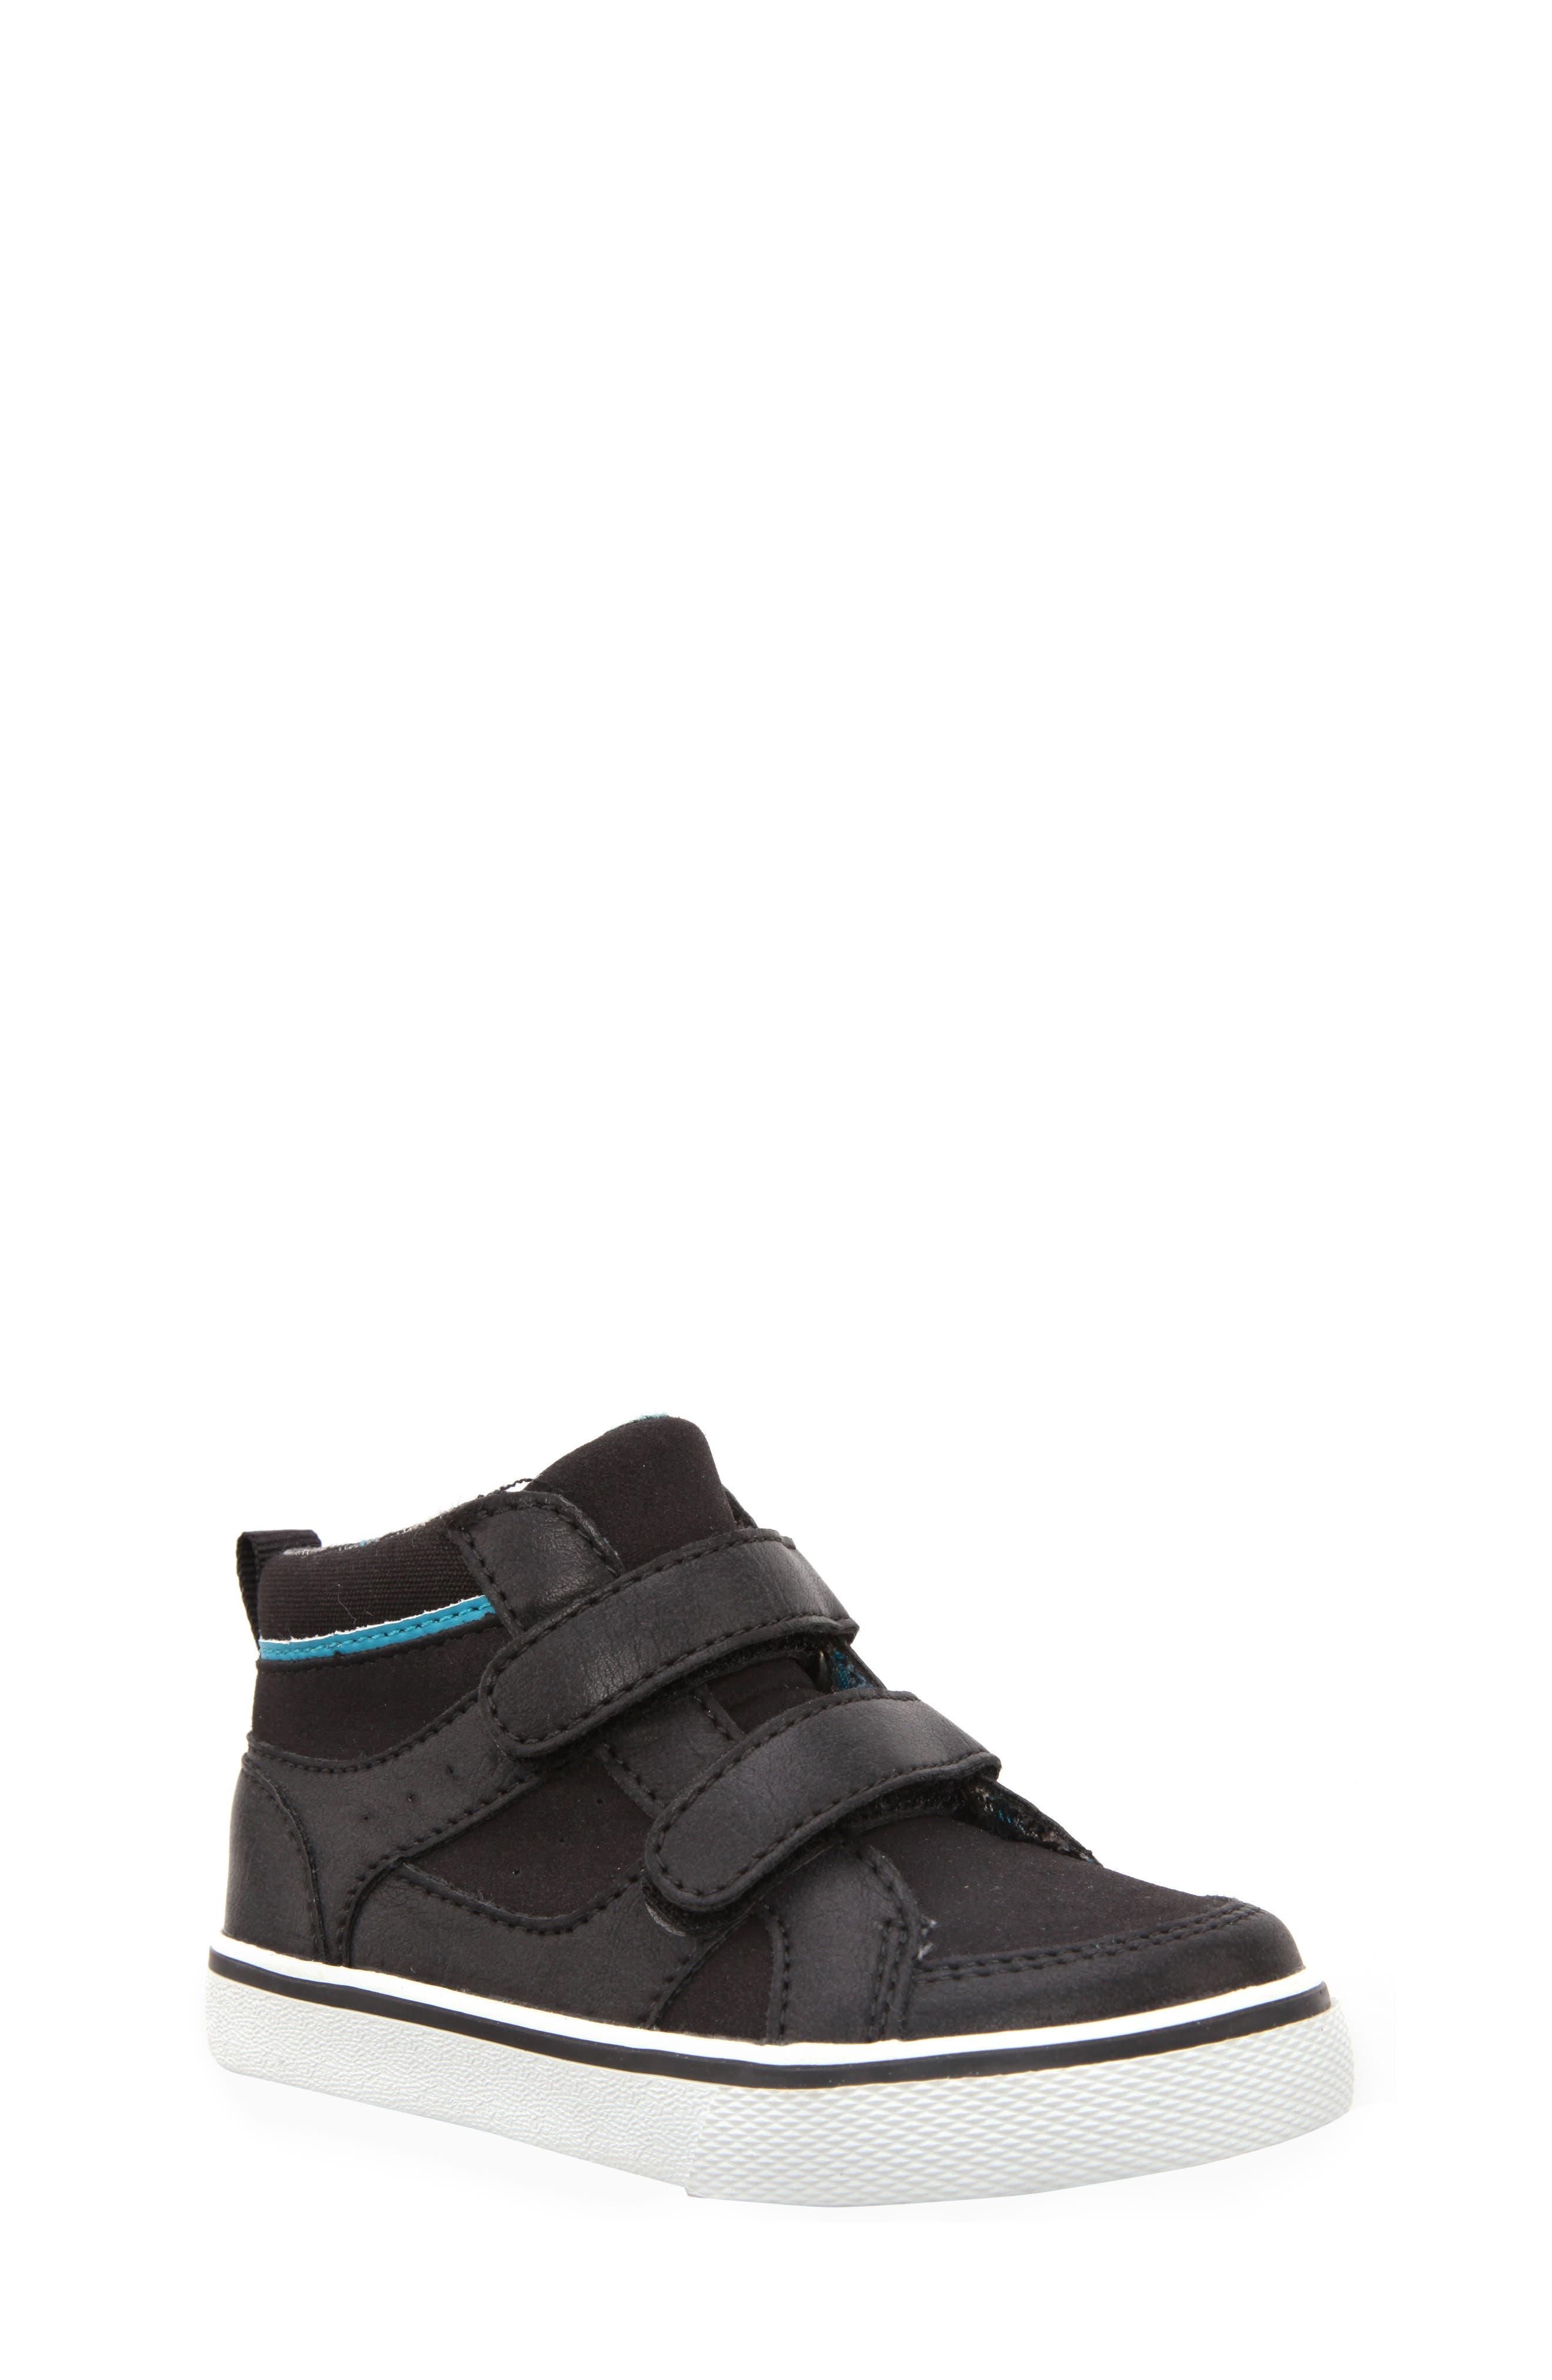 Roy Mid Top Sneaker,                             Main thumbnail 1, color,                             010